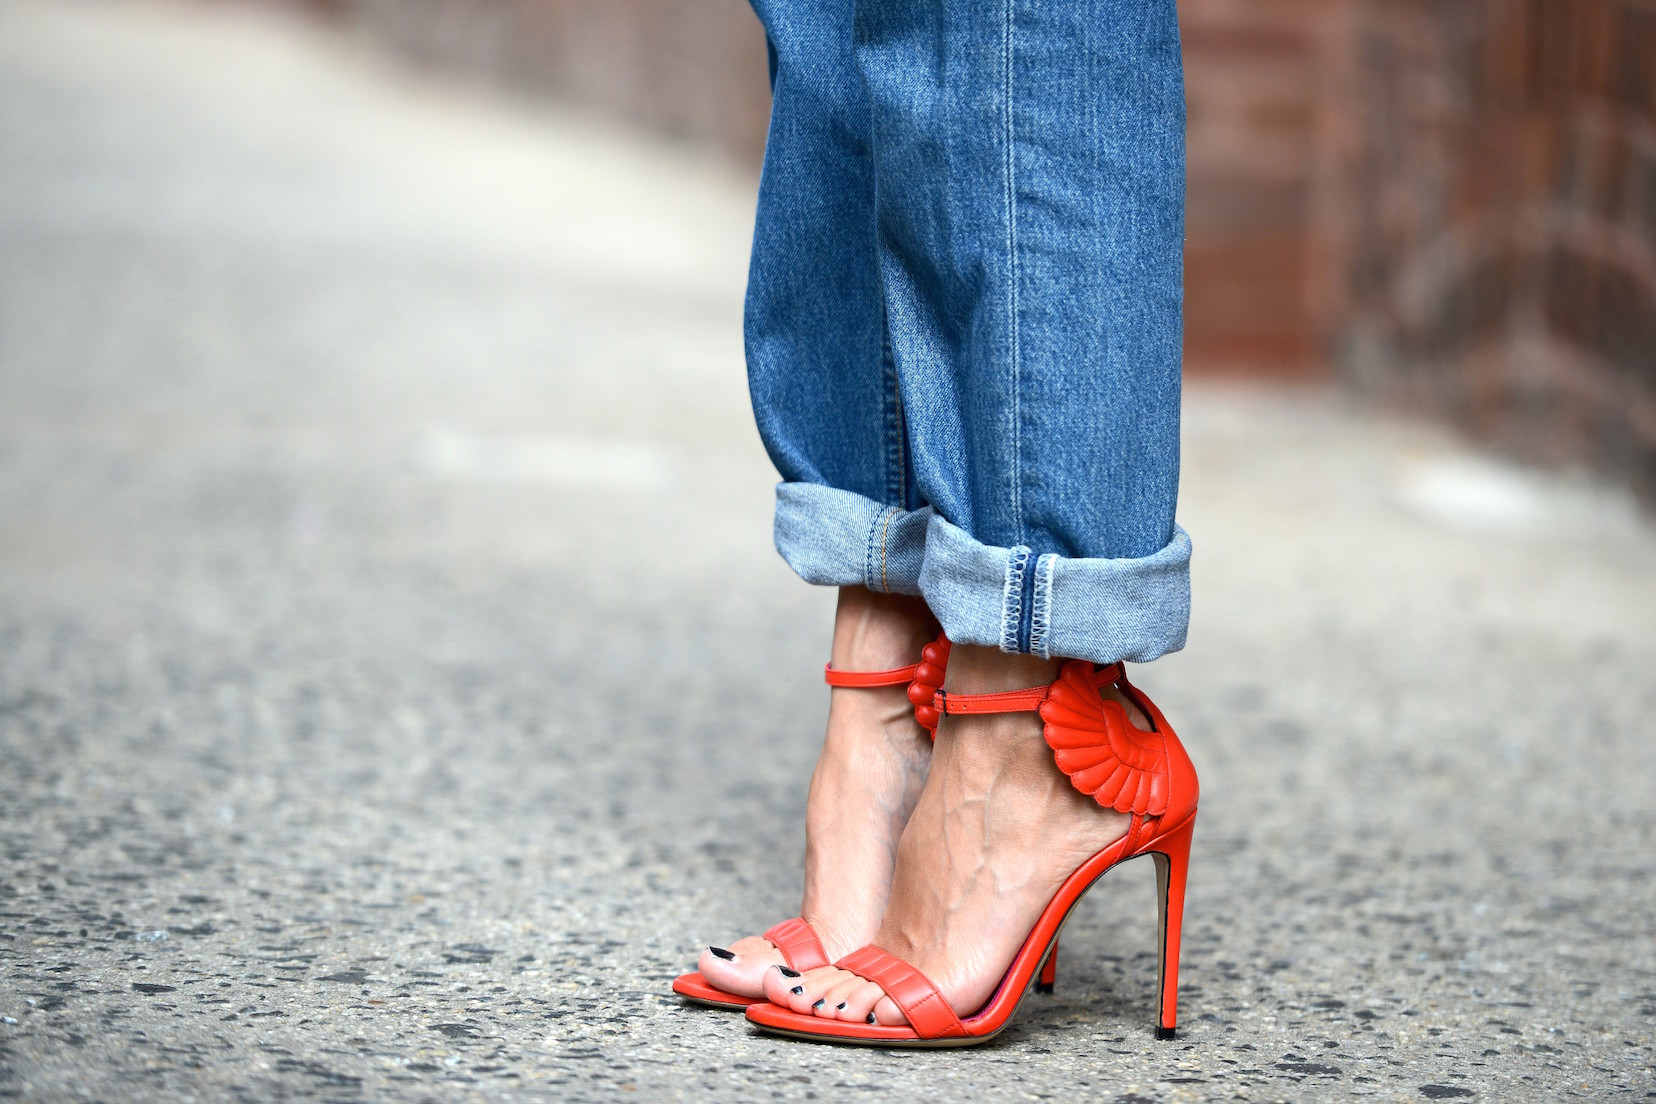 Stasera vuoi inaugurare i nuovi sandali tacco 12 usa i for 700 piedi quadrati a casa